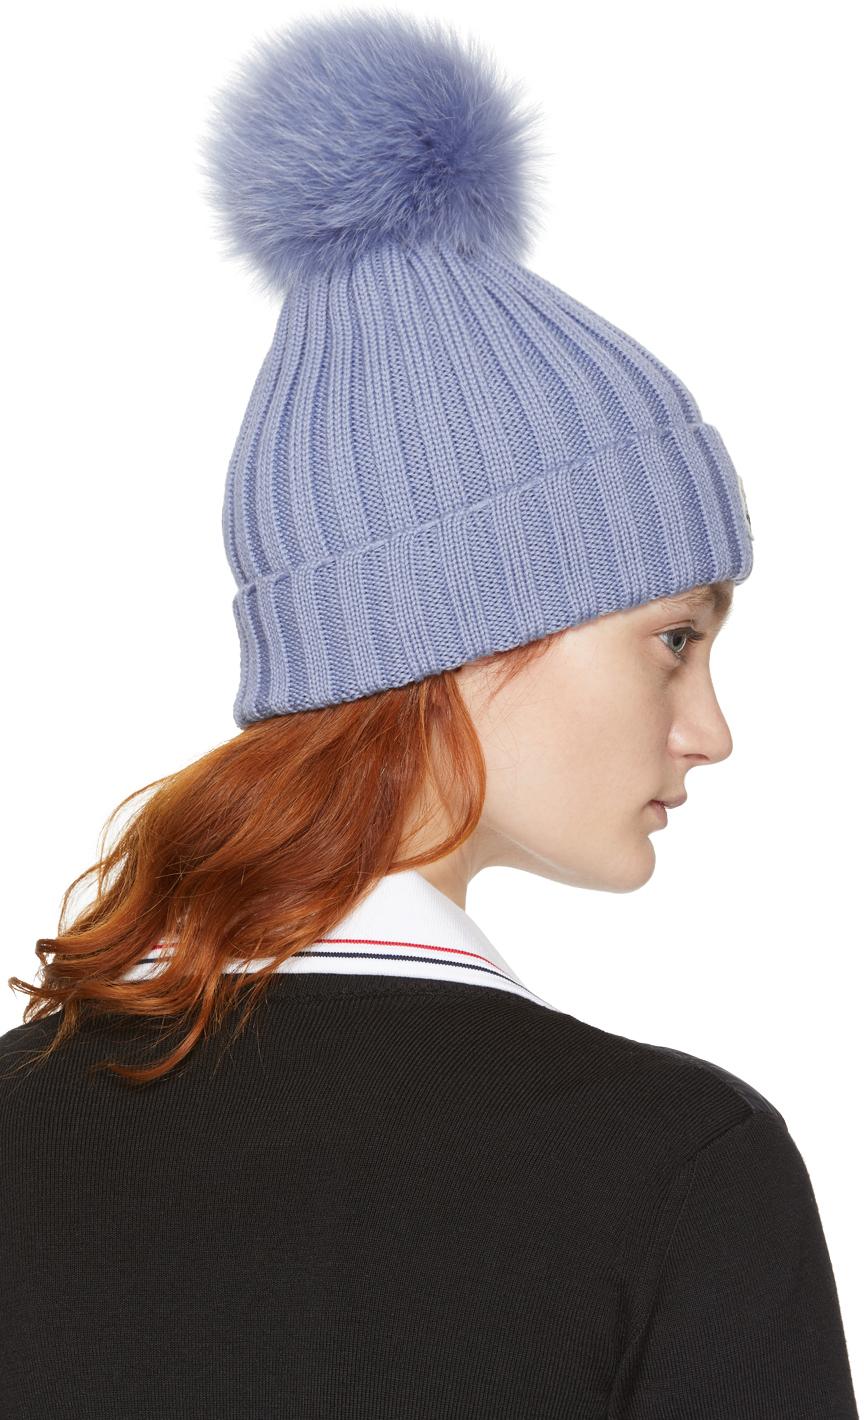 ▌Outfit ▌潮媽的條件(下):Moncler Pom Pom Beanie毛球帽+火紅的Balenciaga logo hoodie連帽衛衣+Burberry Rucksack粉紫小背包